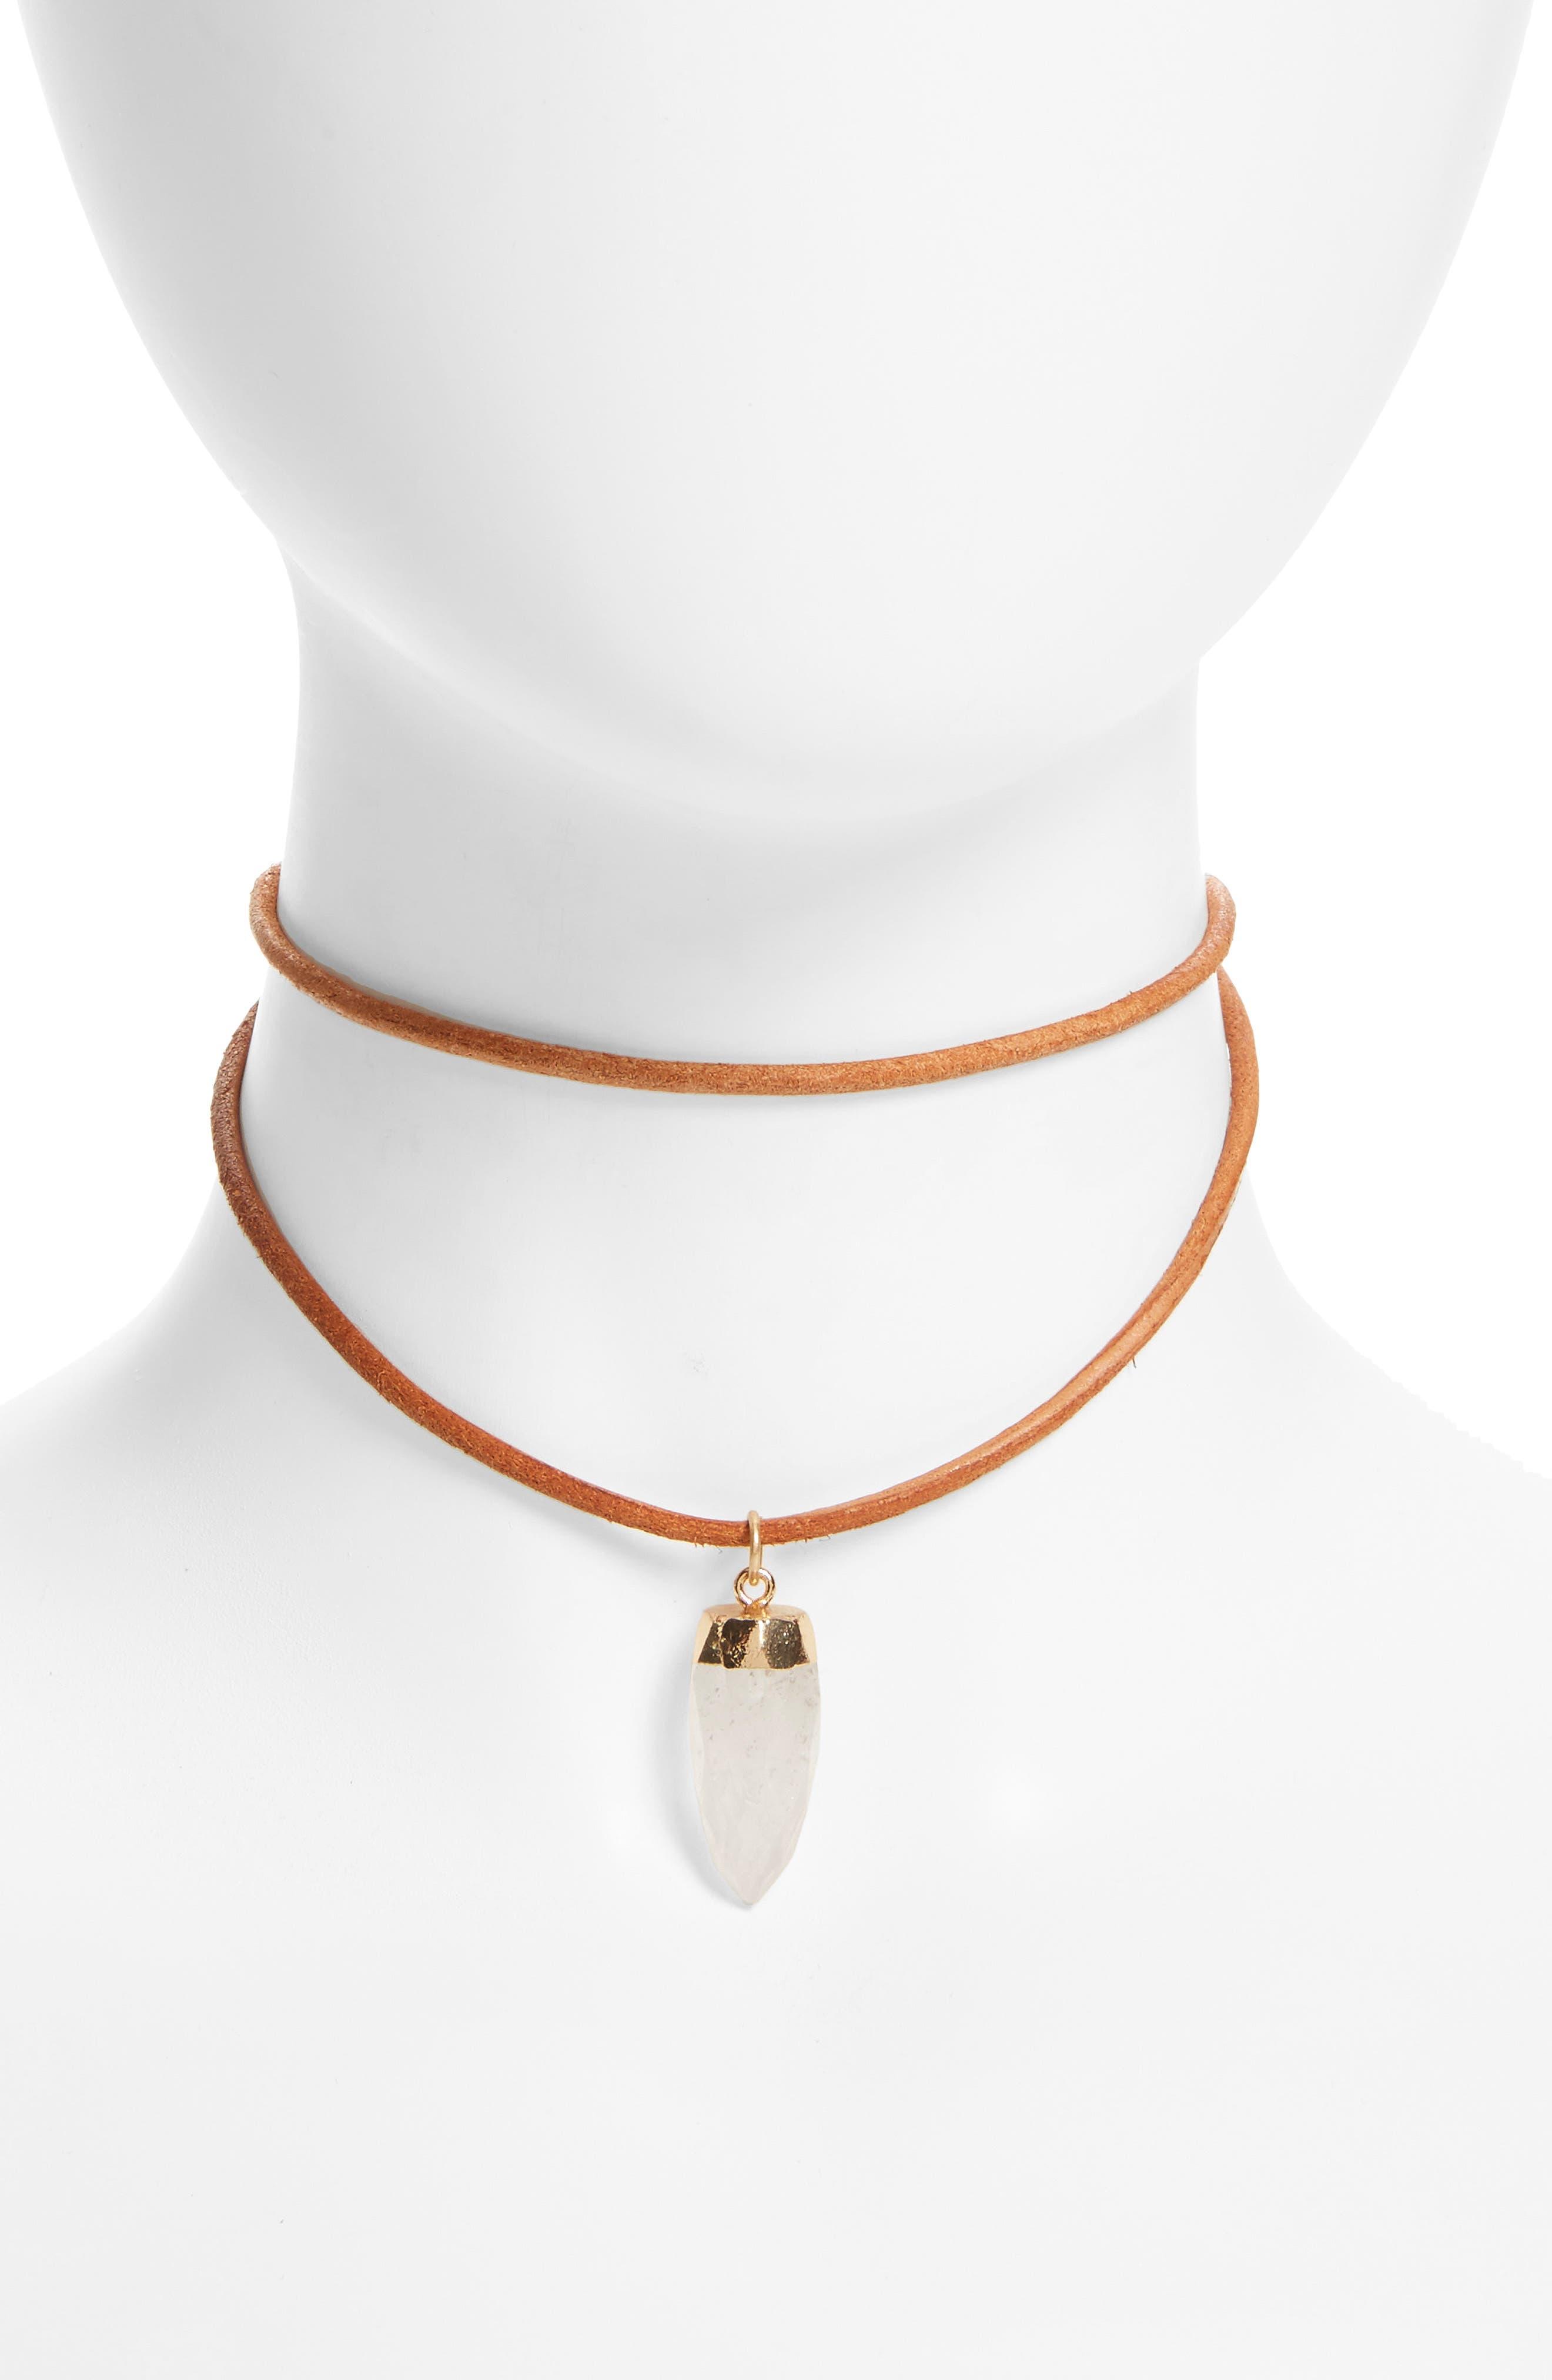 Panacea Drop Layered Choker Necklace